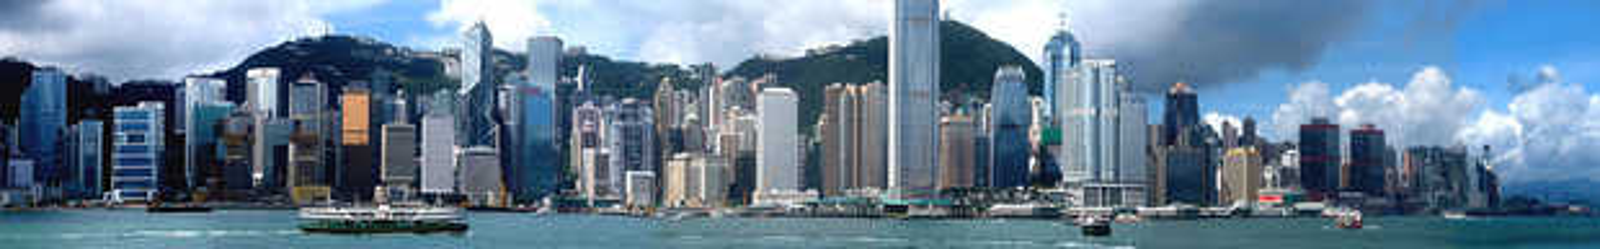 Hong Kong, Skyline #3 - Larry Yust